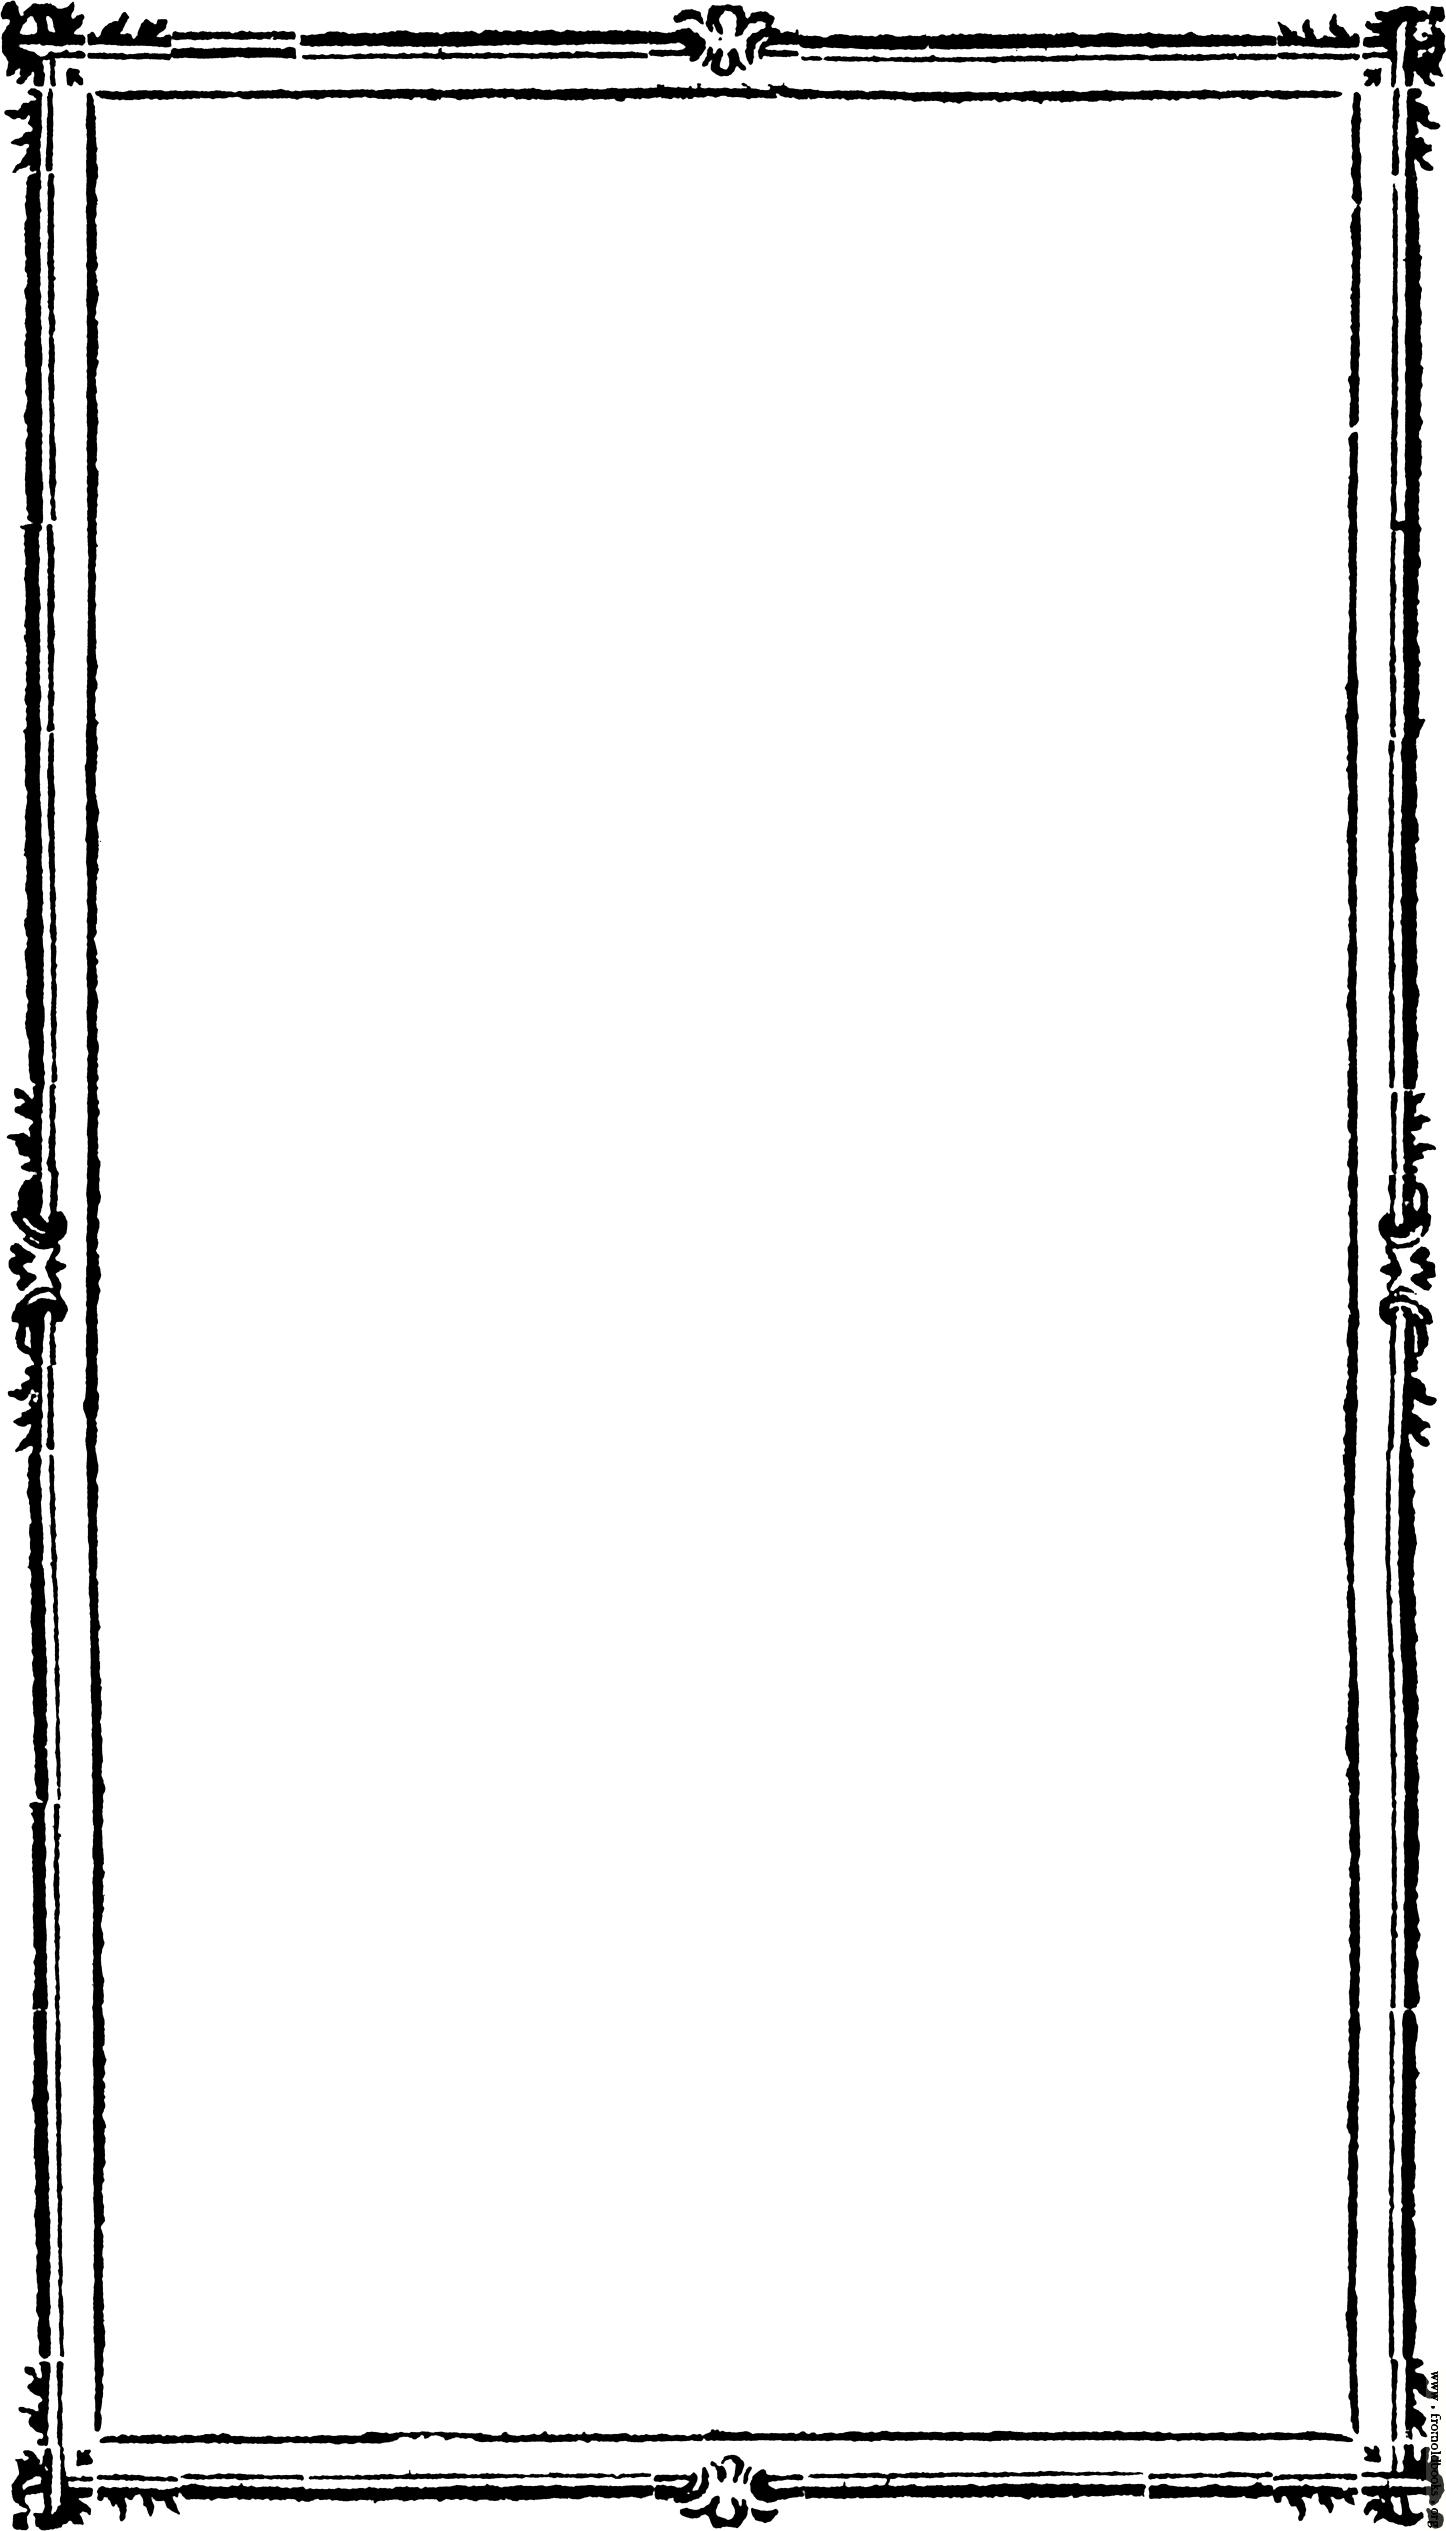 Modern frame clipart banner download Modern Clip Art Border - Clip Art Library banner download